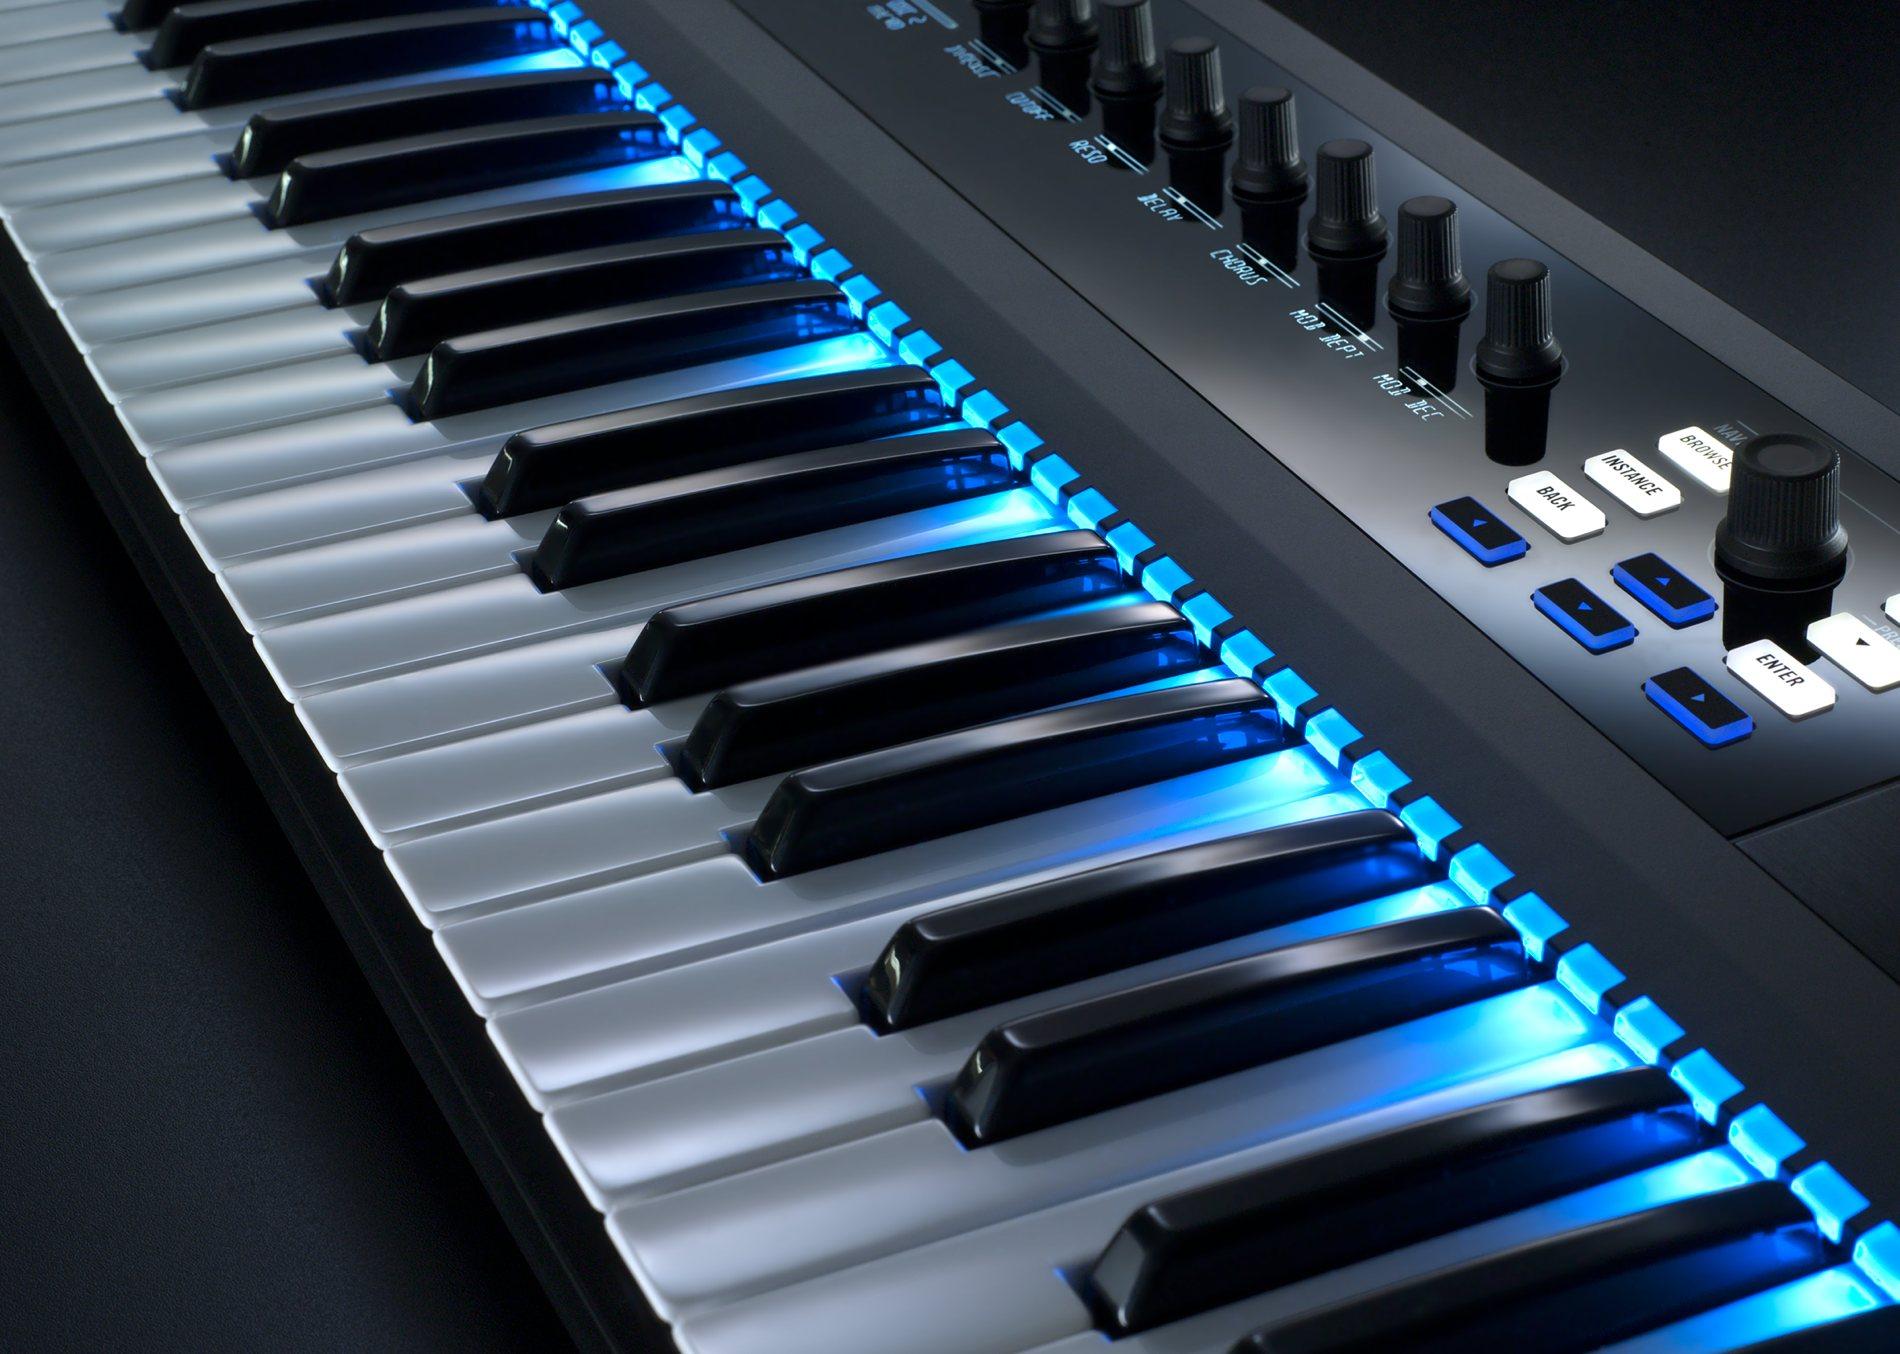 instruments keyboard wallpaper - photo #7